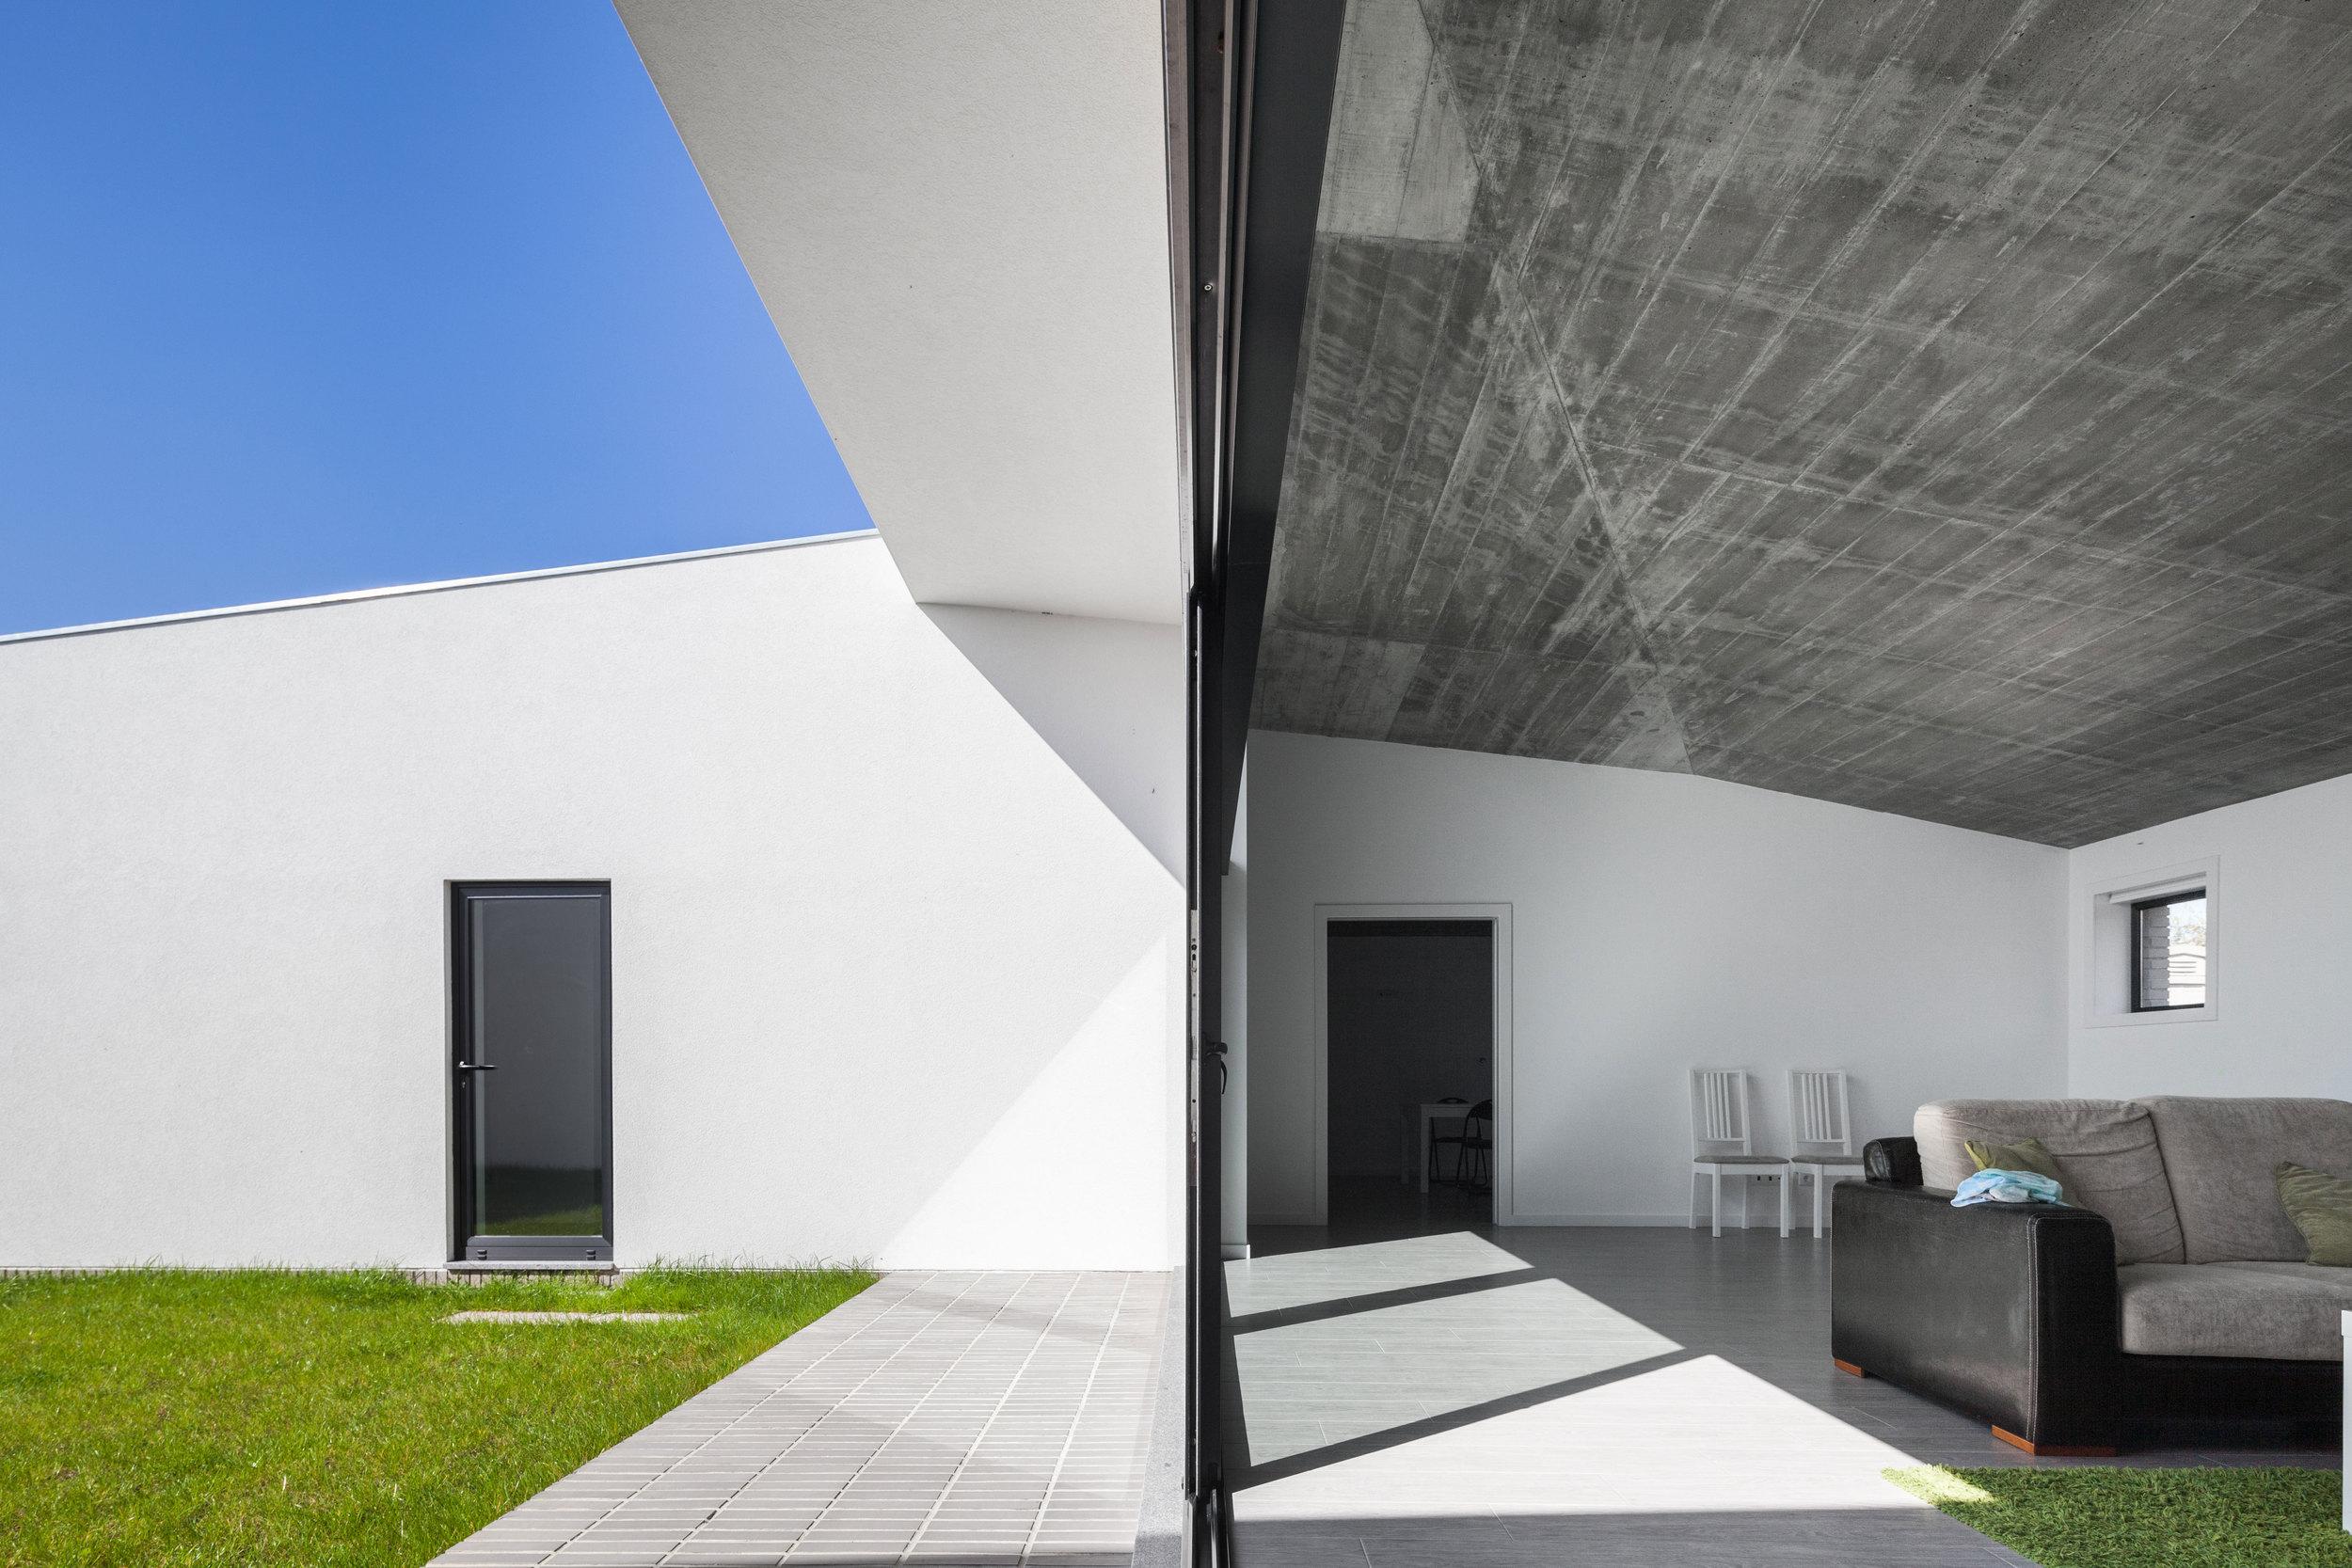 PROD_Open_patio_house_interior_exterior.jpg